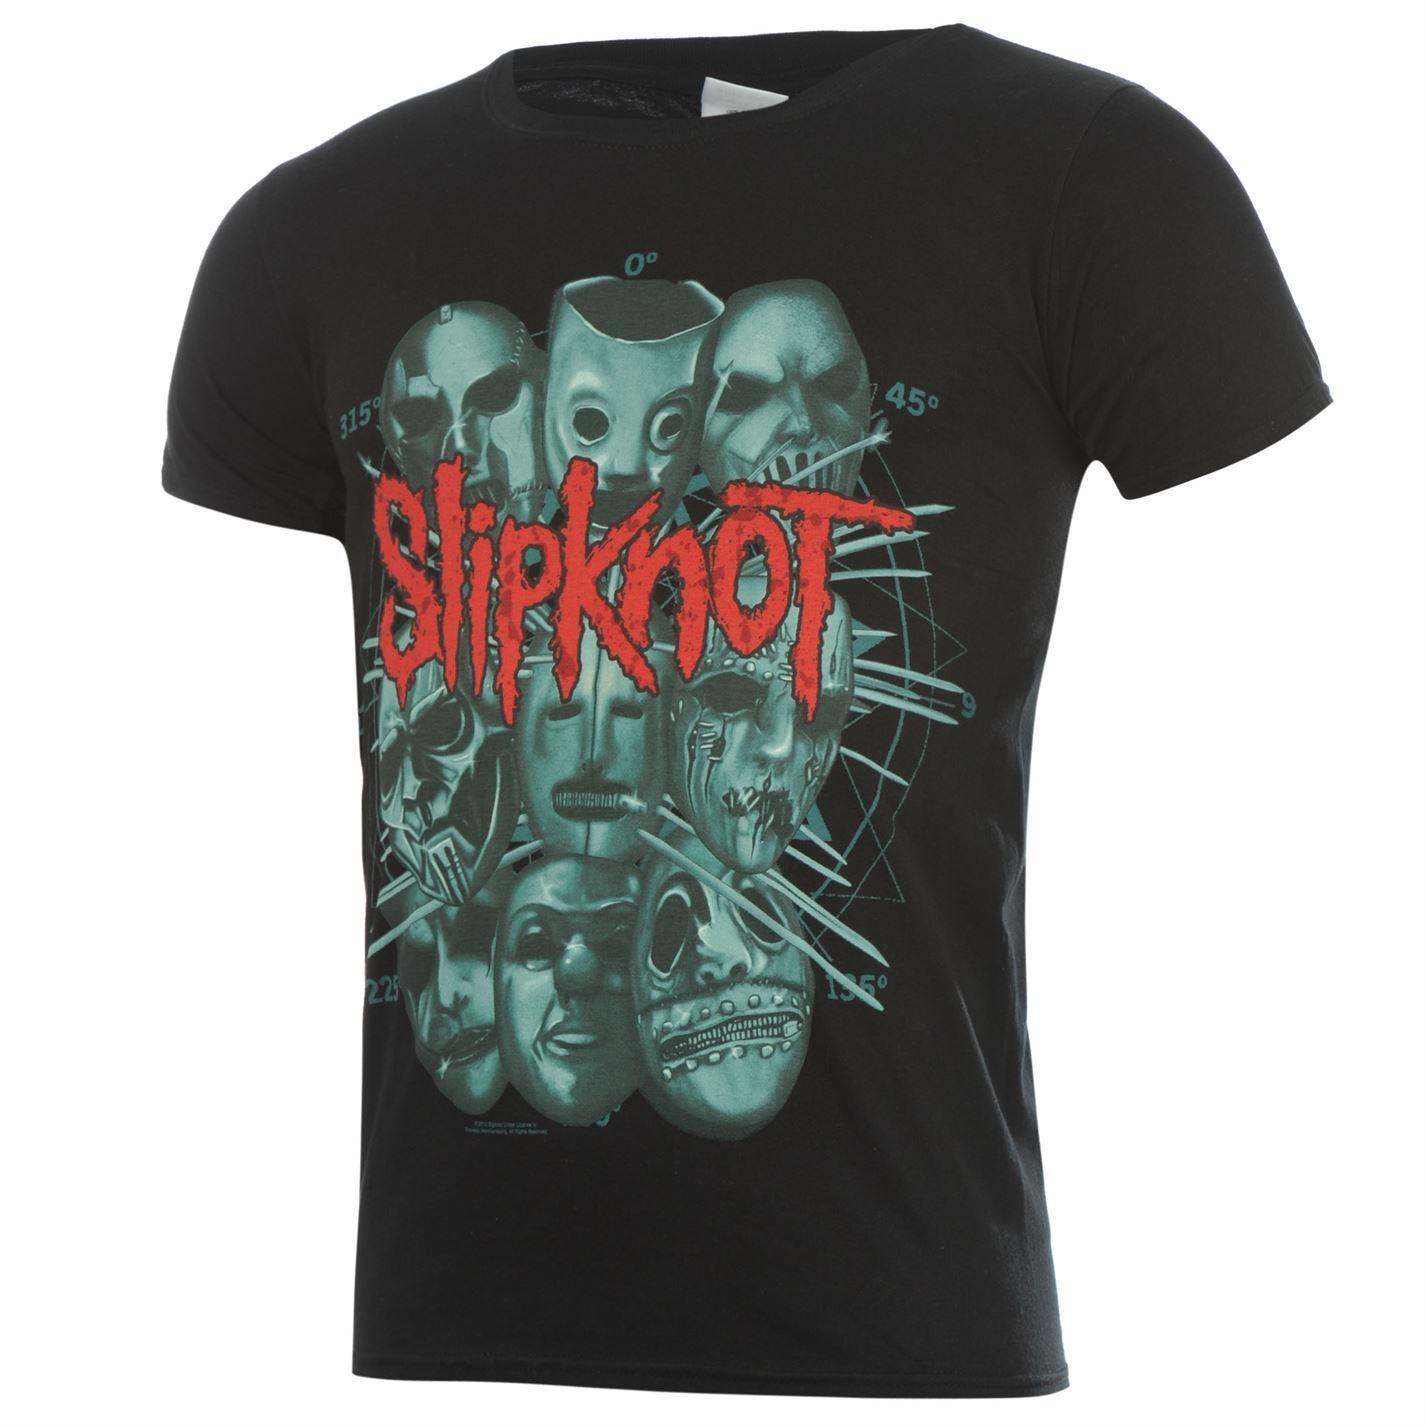 Official-Slipknot-T-Shirt-Mens-Masks-Top-Tee-Tshirt thumbnail 6